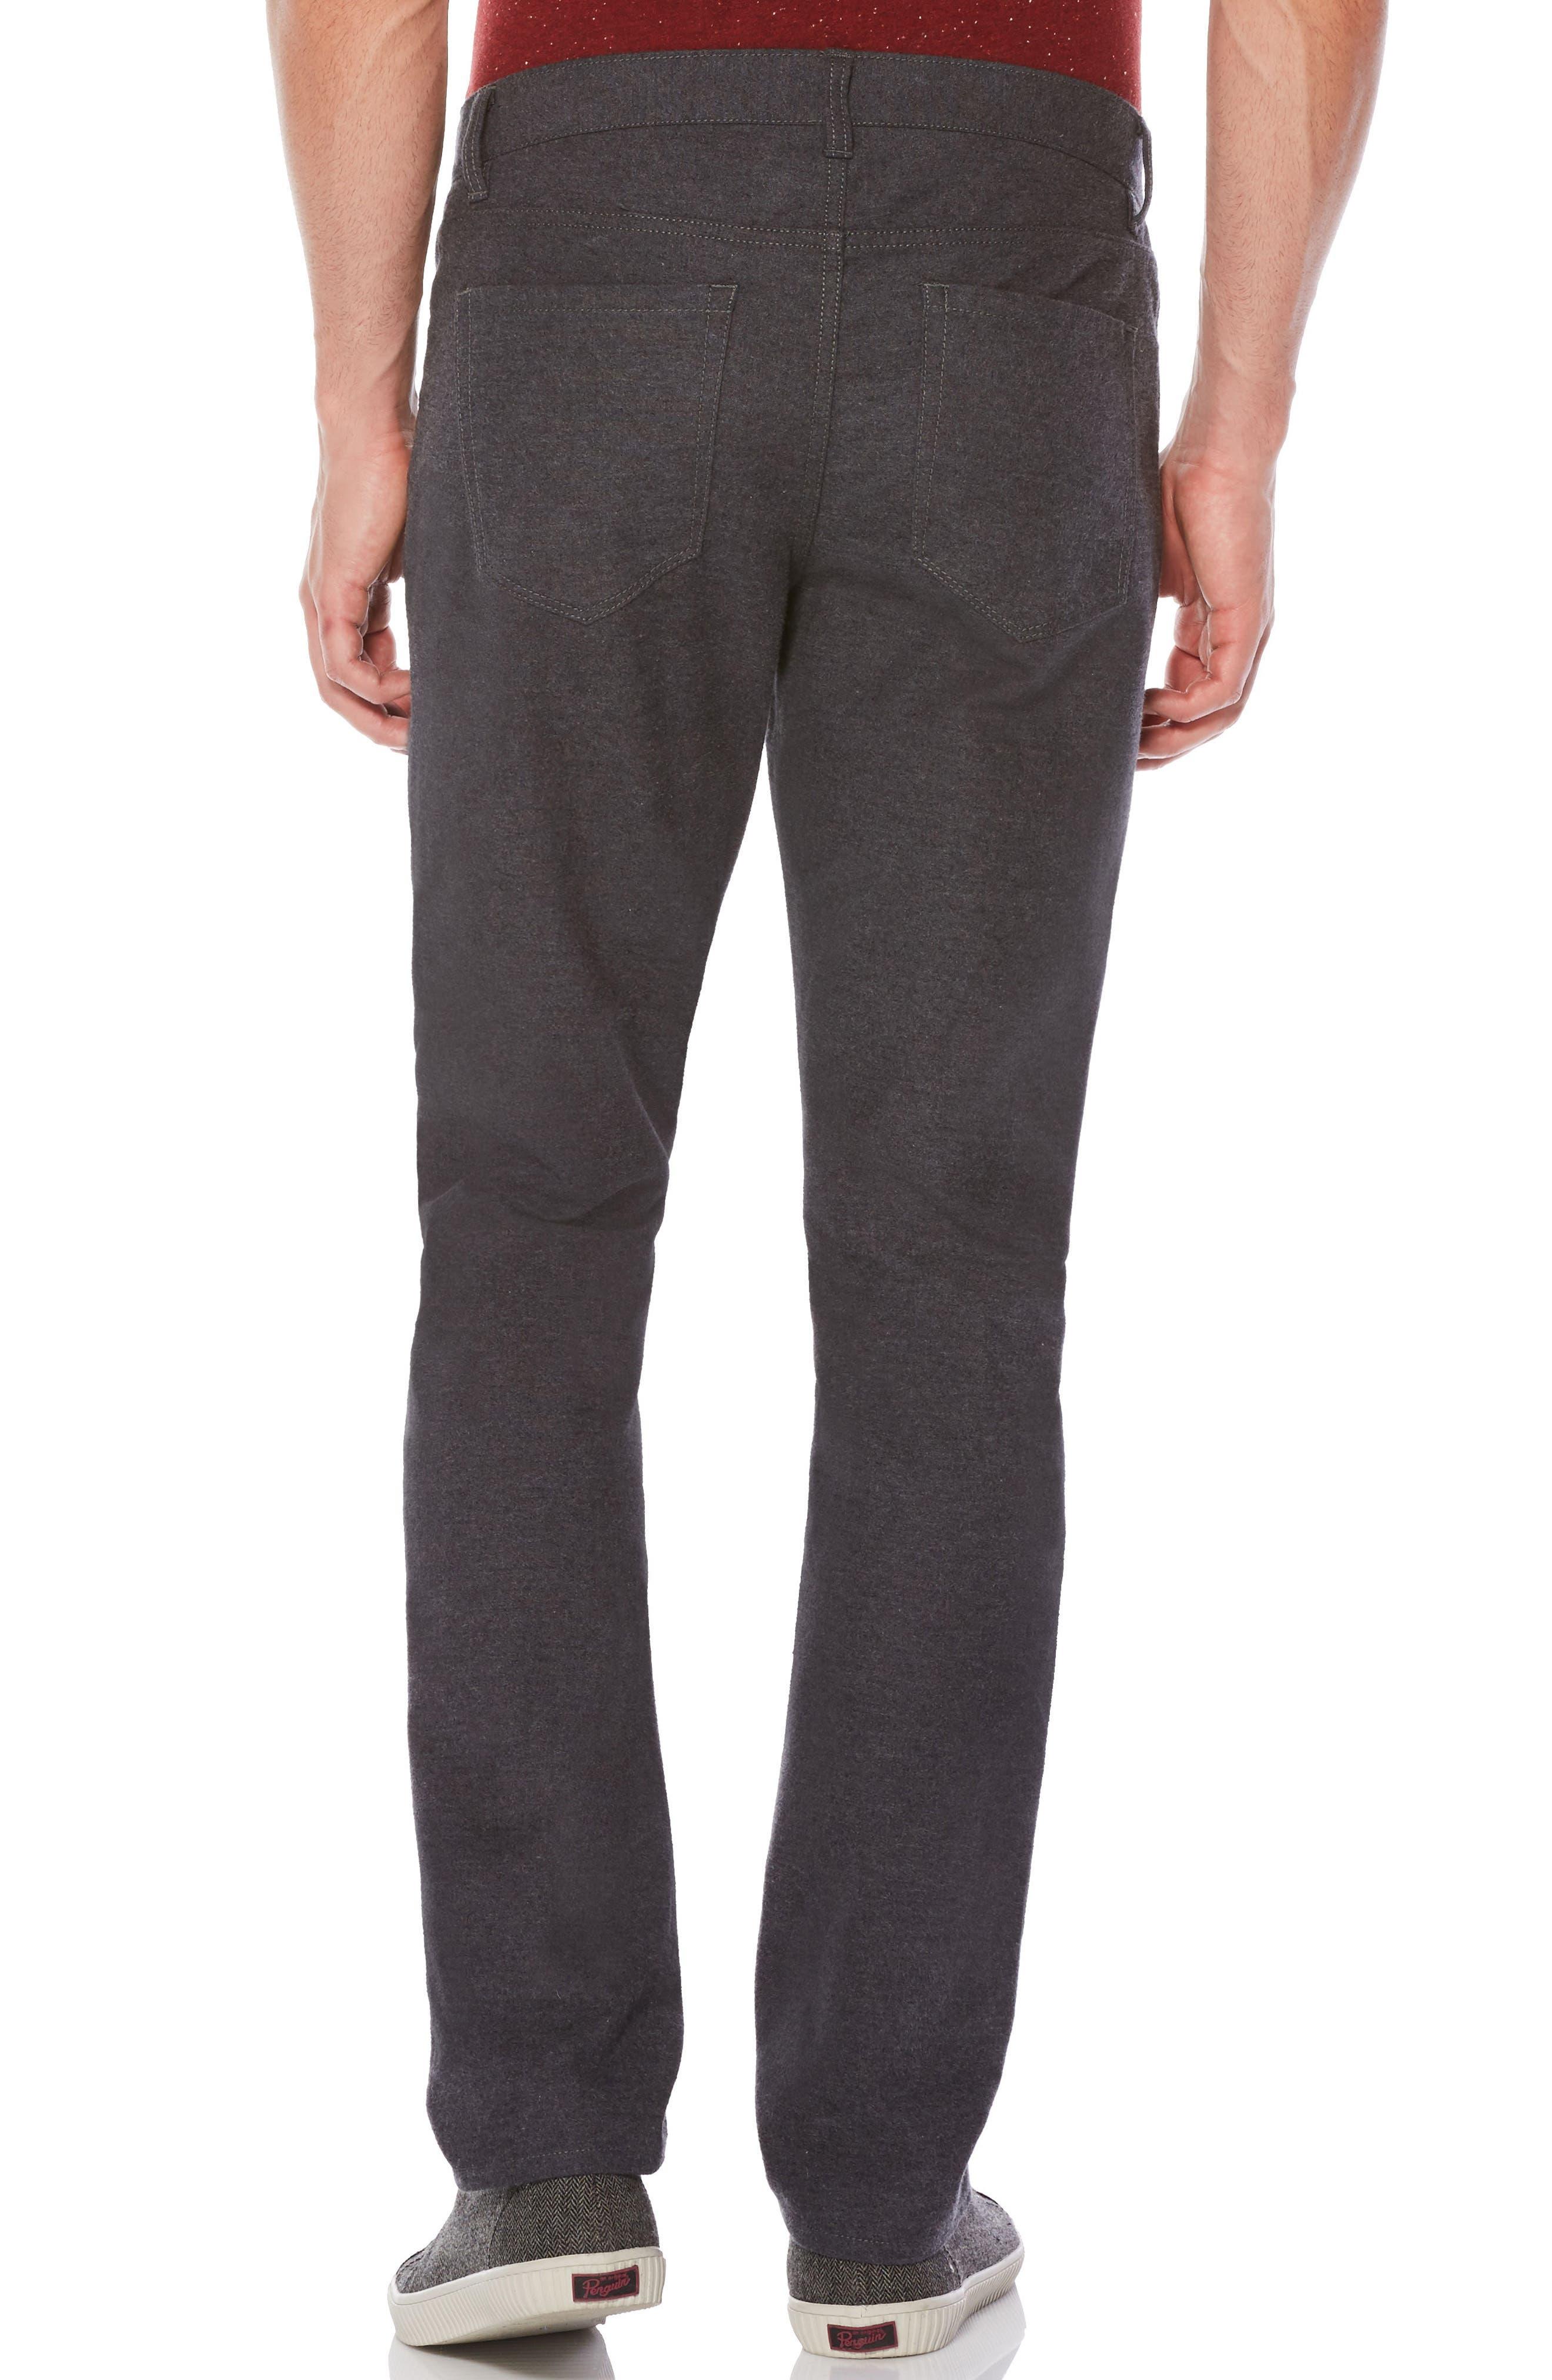 P55 Slim Fit Brushed Cotton Pants,                             Alternate thumbnail 2, color,                             022